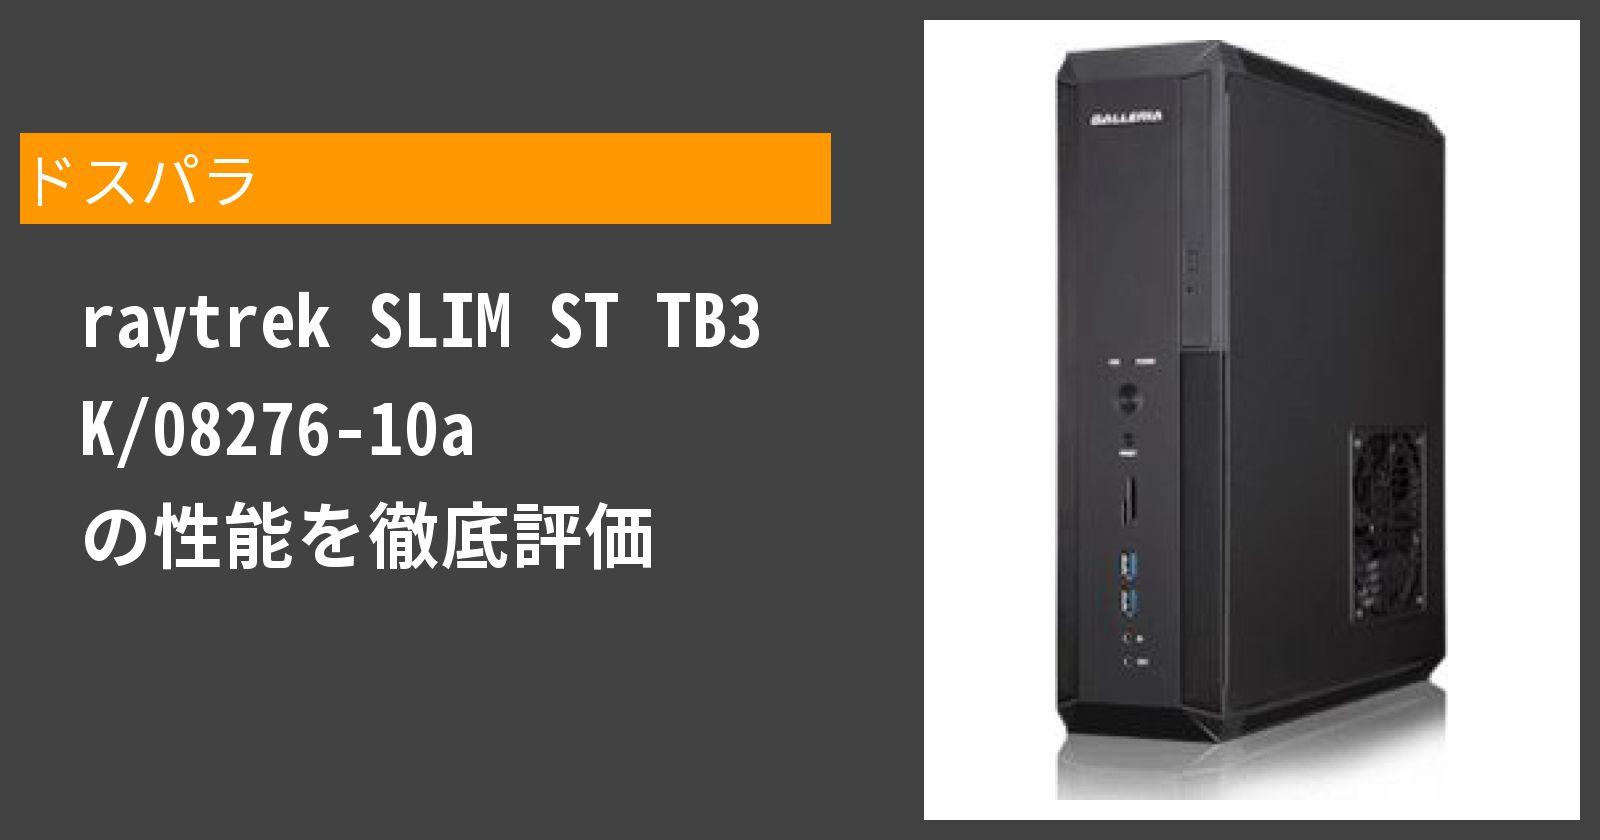 raytrek SLIM ST TB3 K/08276-10a の性能を徹底評価